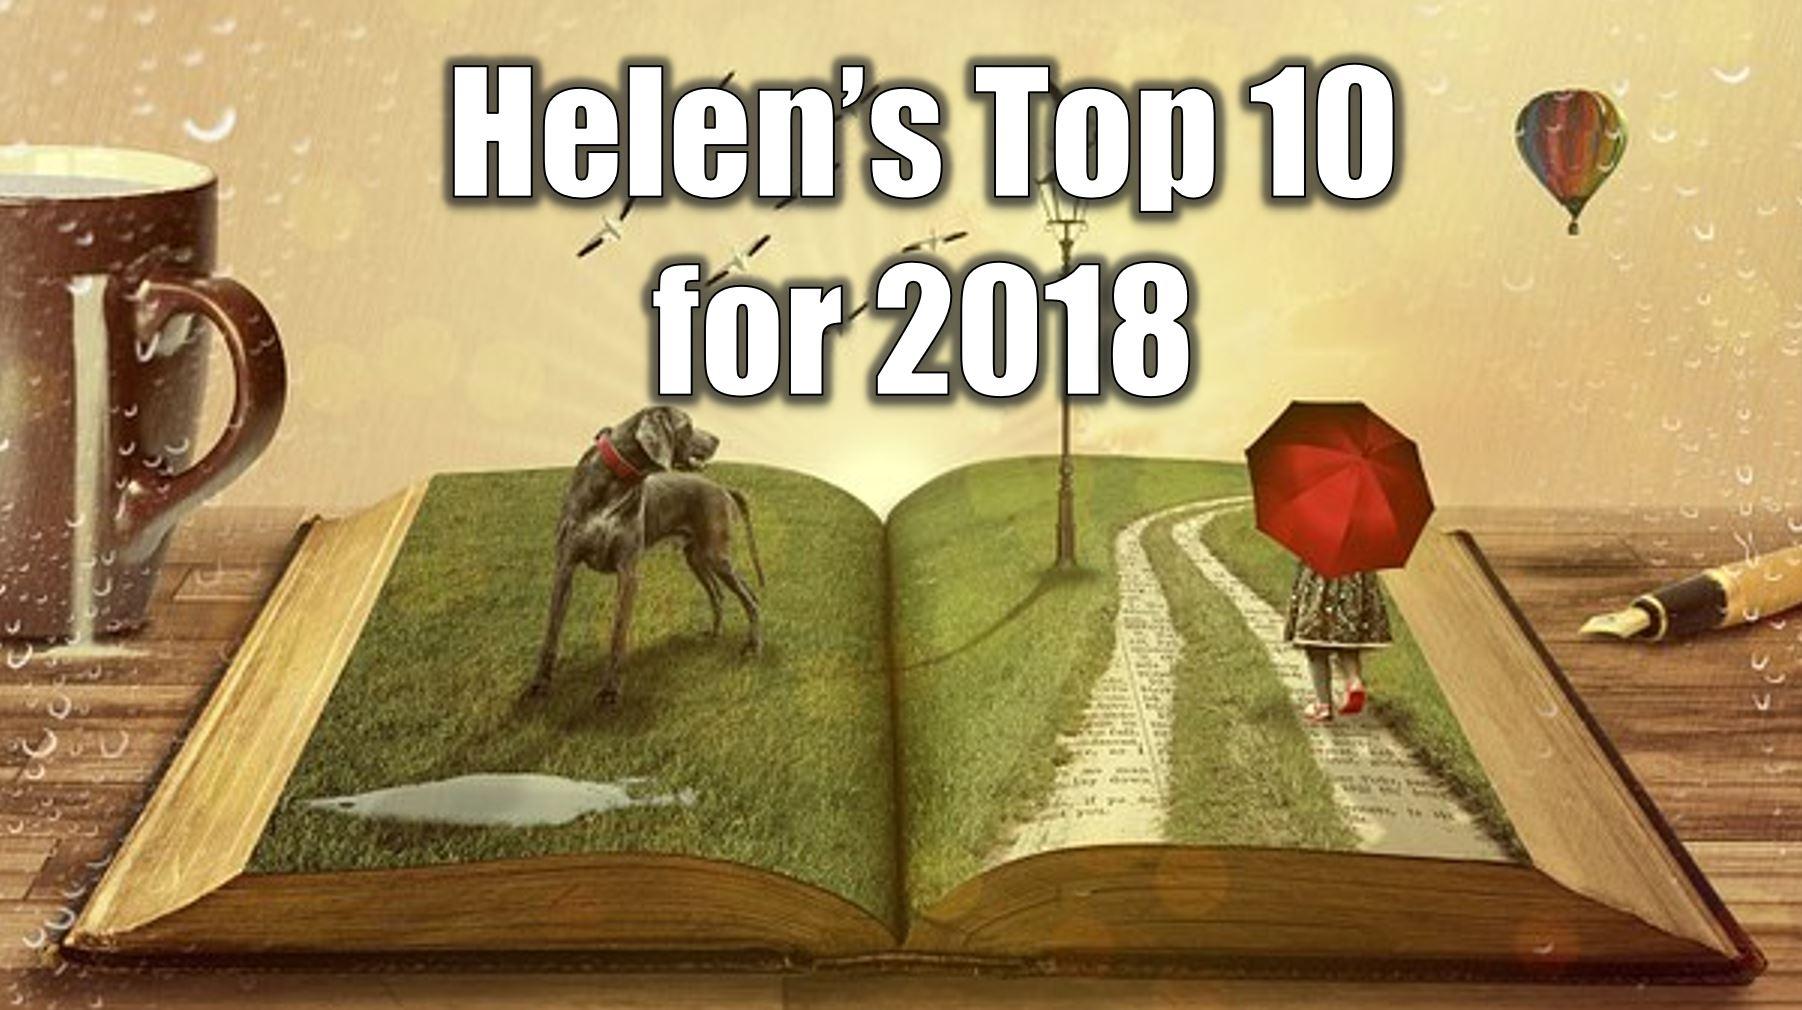 Helen's top 10 2018 reads